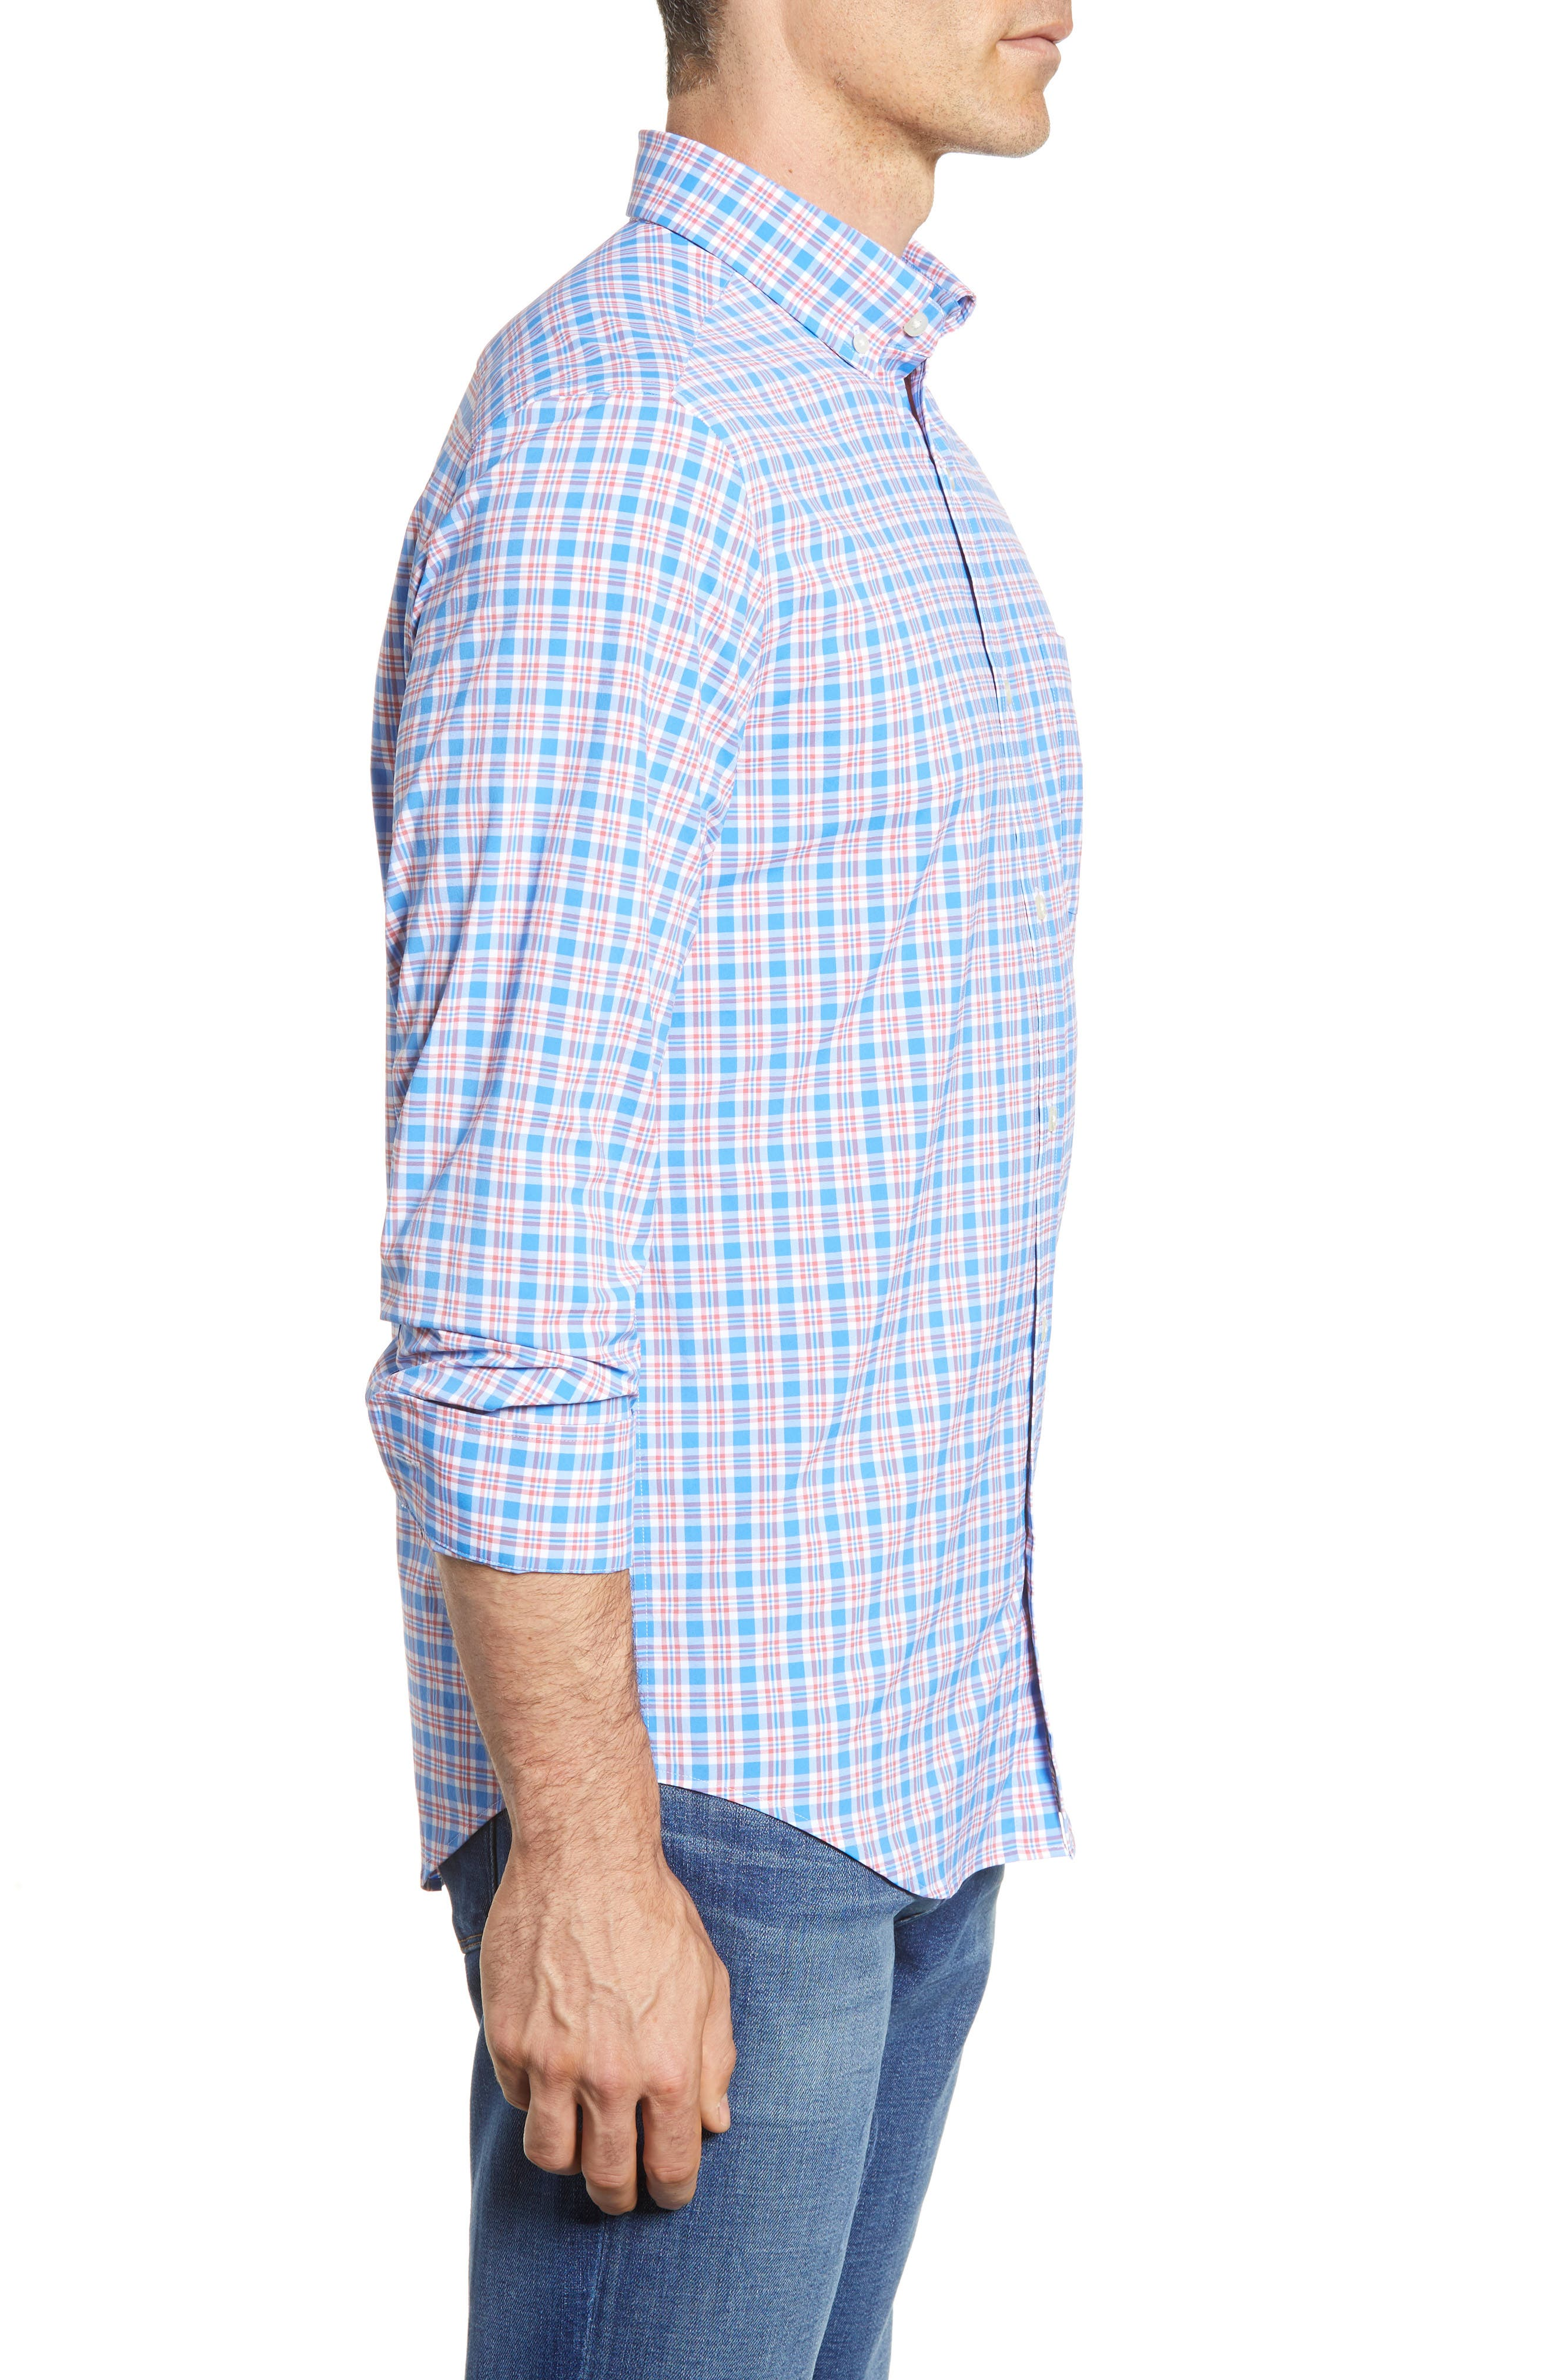 VINEYARD VINES,                             Lighthouse Road Regular Fit Plaid Sport Shirt,                             Alternate thumbnail 4, color,                             415